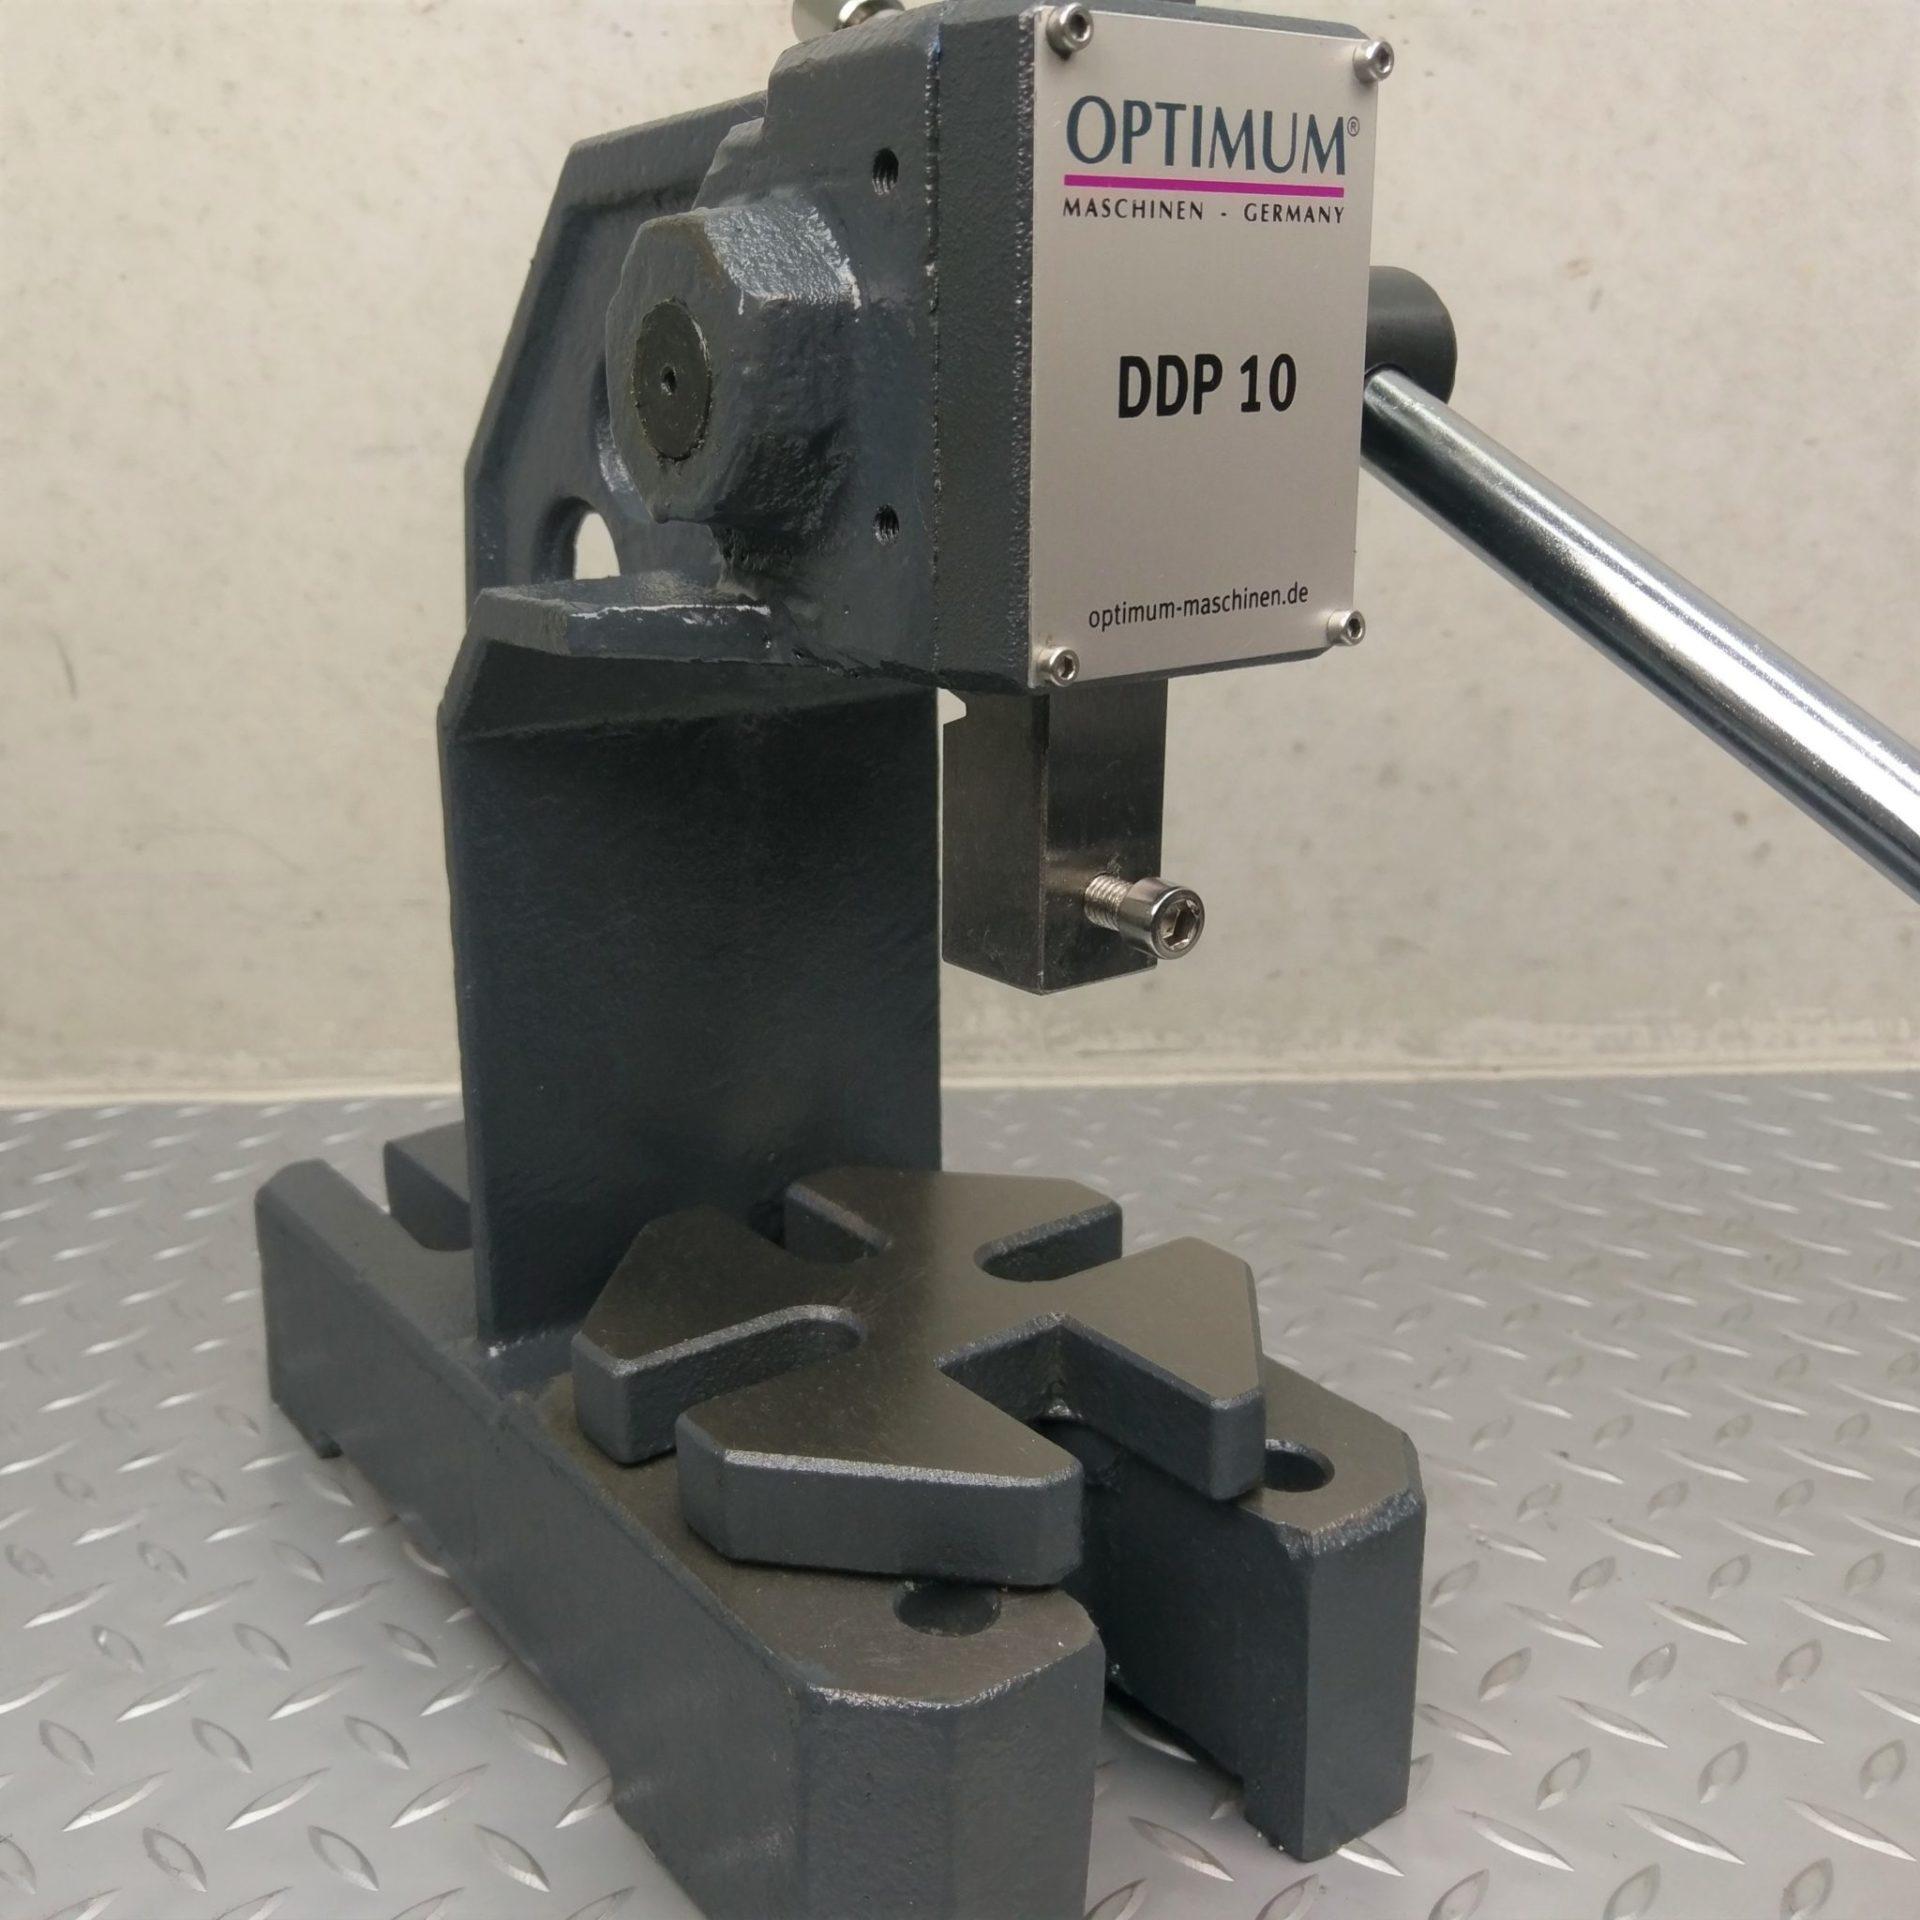 Optimum 1 Ton Arbor Press Redfoxmachinery